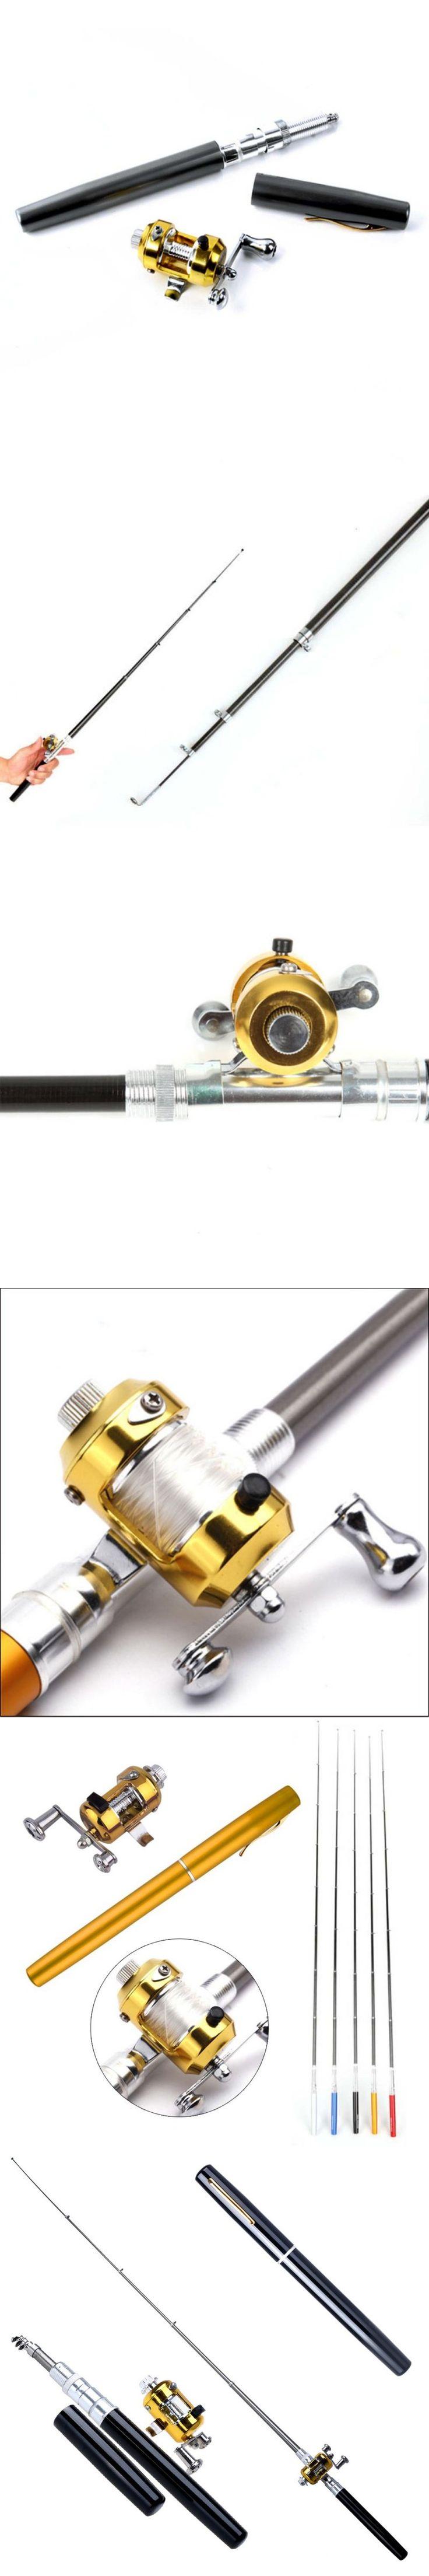 Portable Pocket Telescopic Fishing Pole Pen Shape Foldable Fishing Rod With Reel Wheel